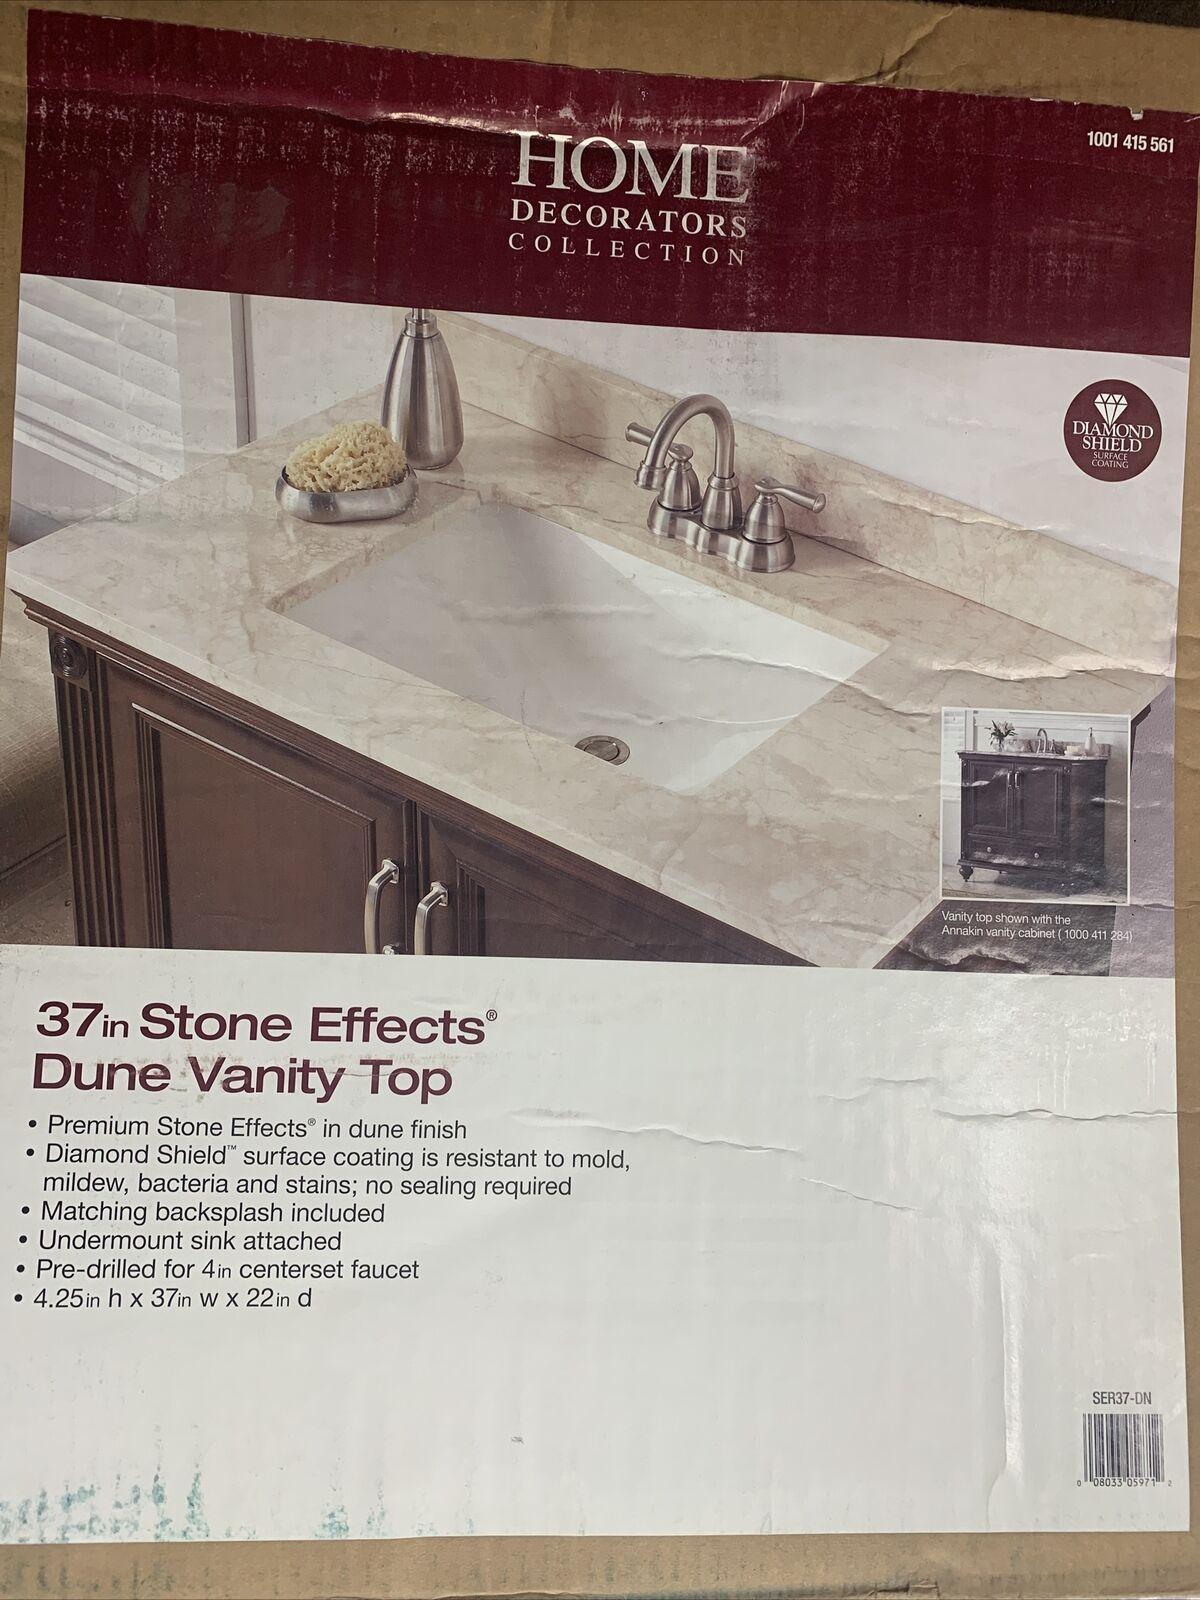 Home Decorators Collection 37 In W X 22 In D Engineered Quartz Vanity Top For Sale Online Ebay